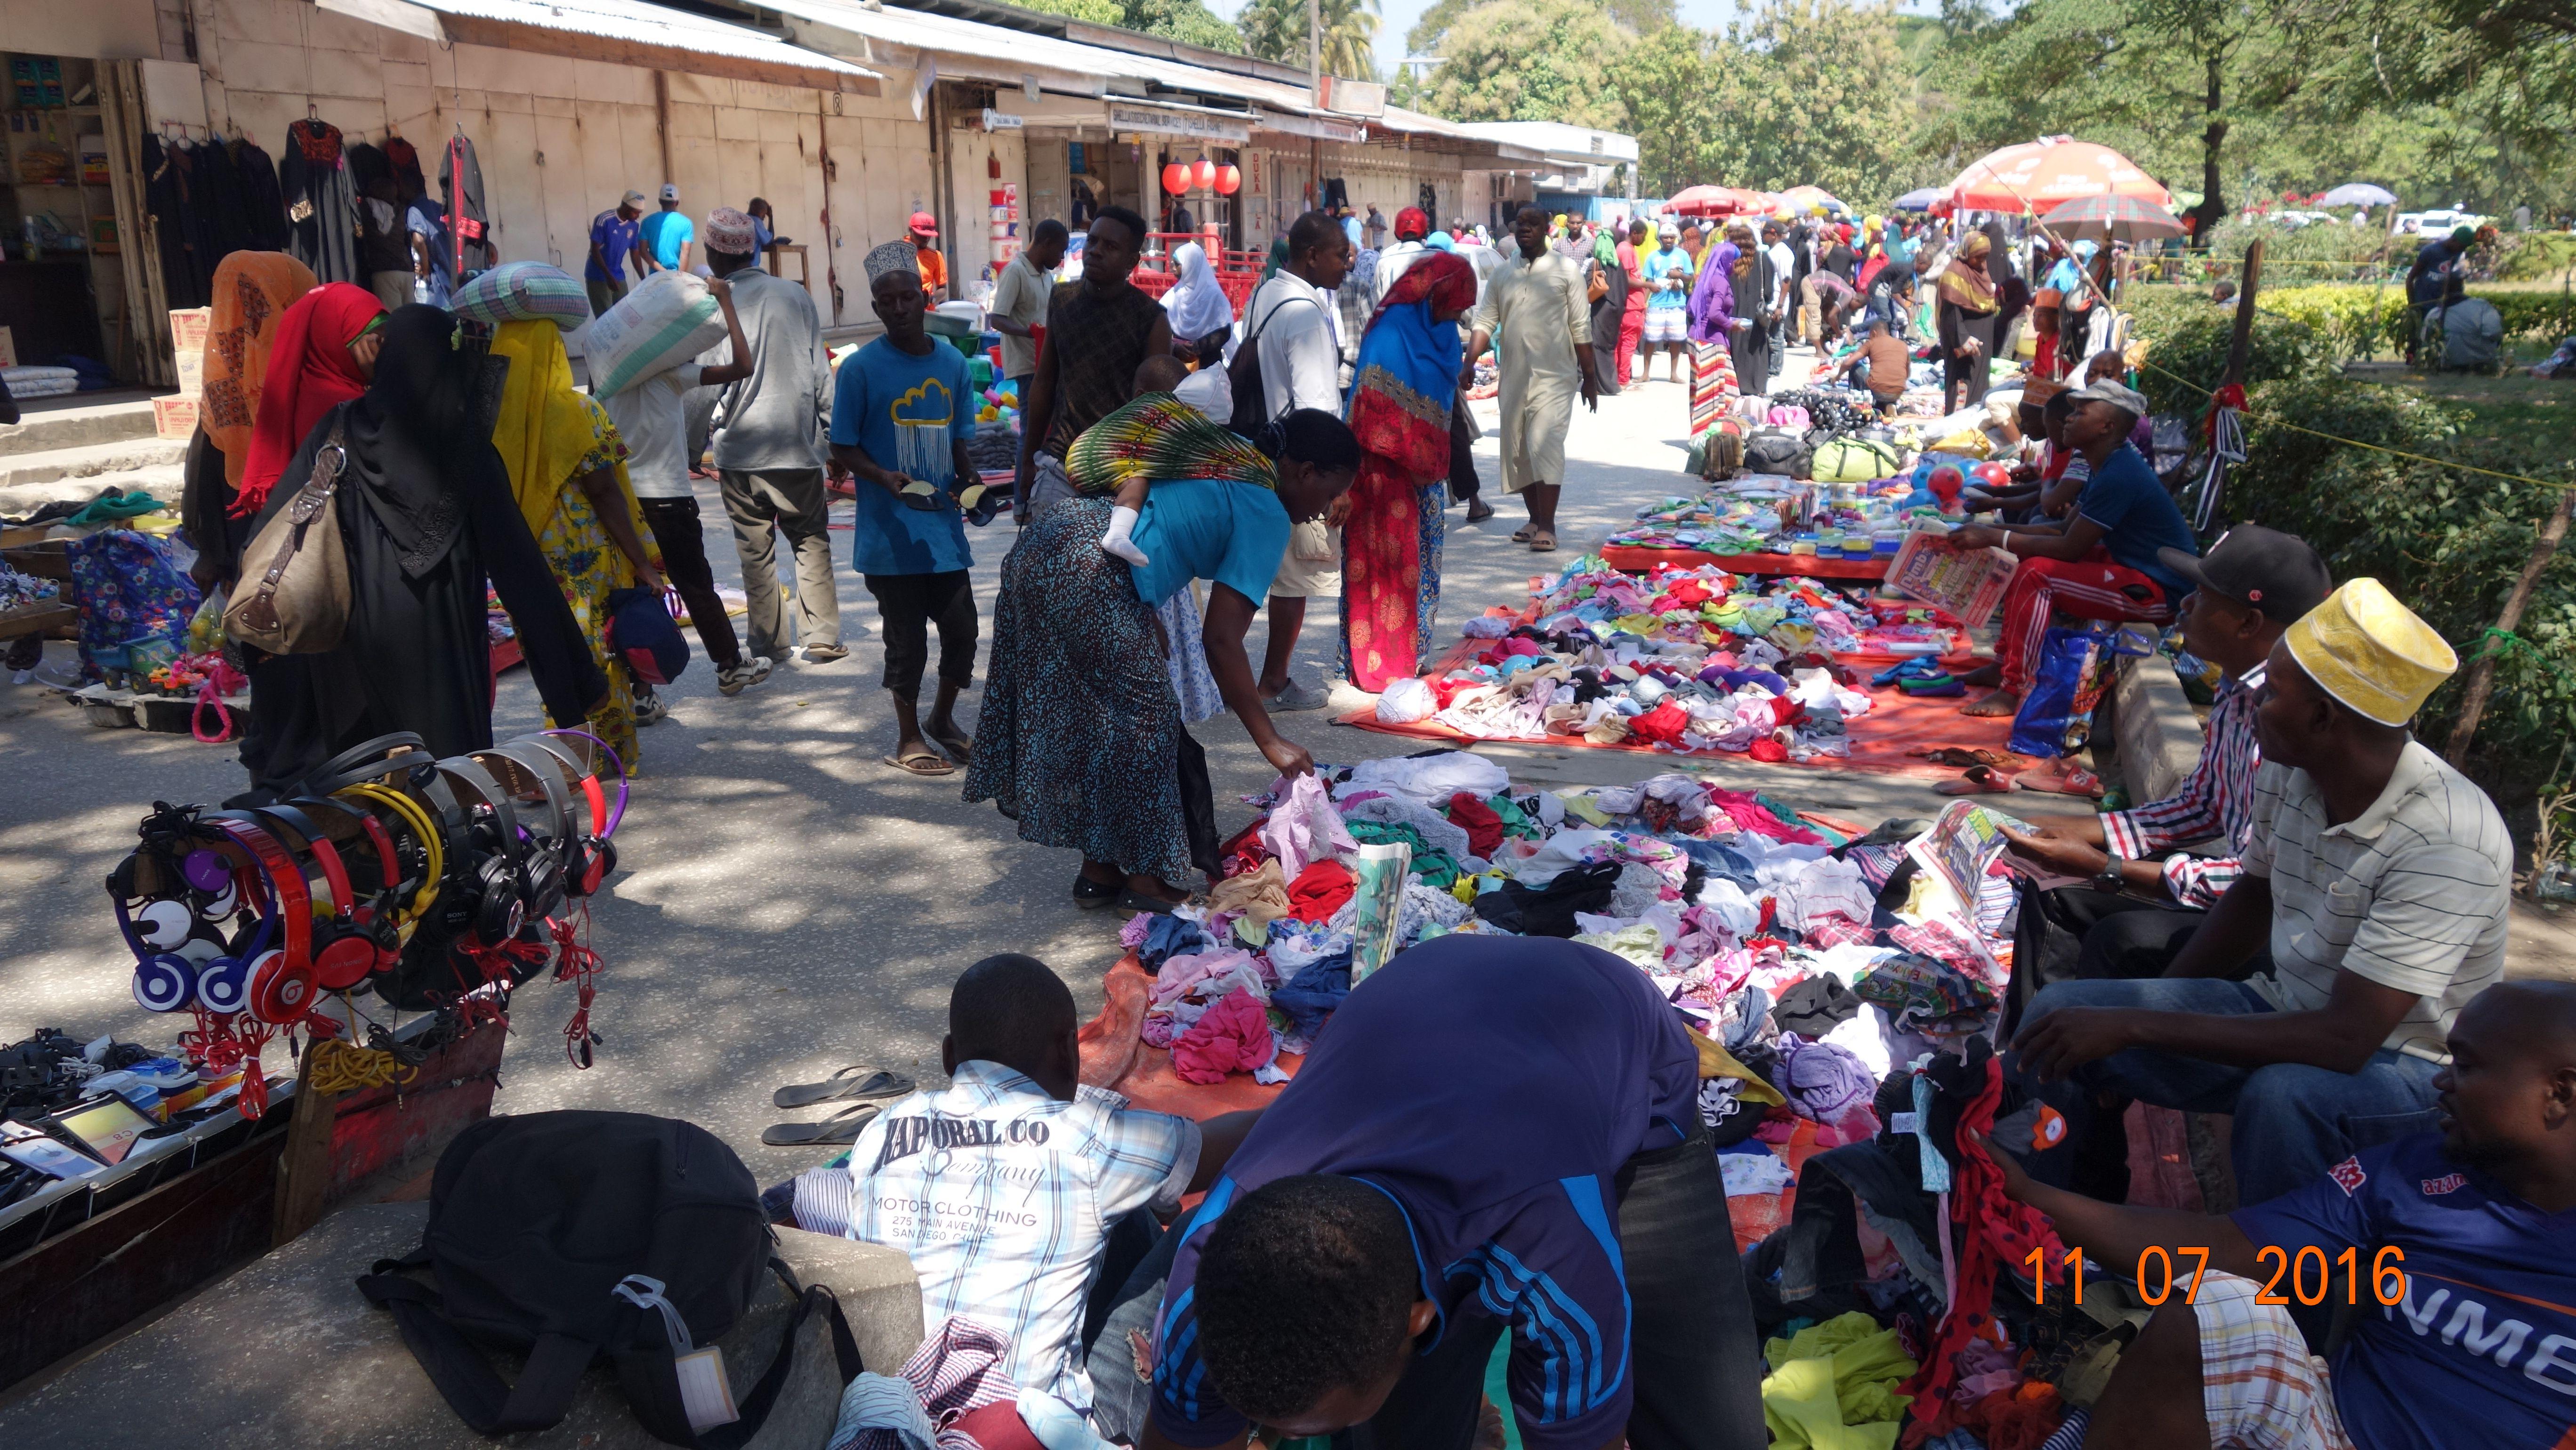 A Typical African Market Place African Market Stone Town Zanzibar